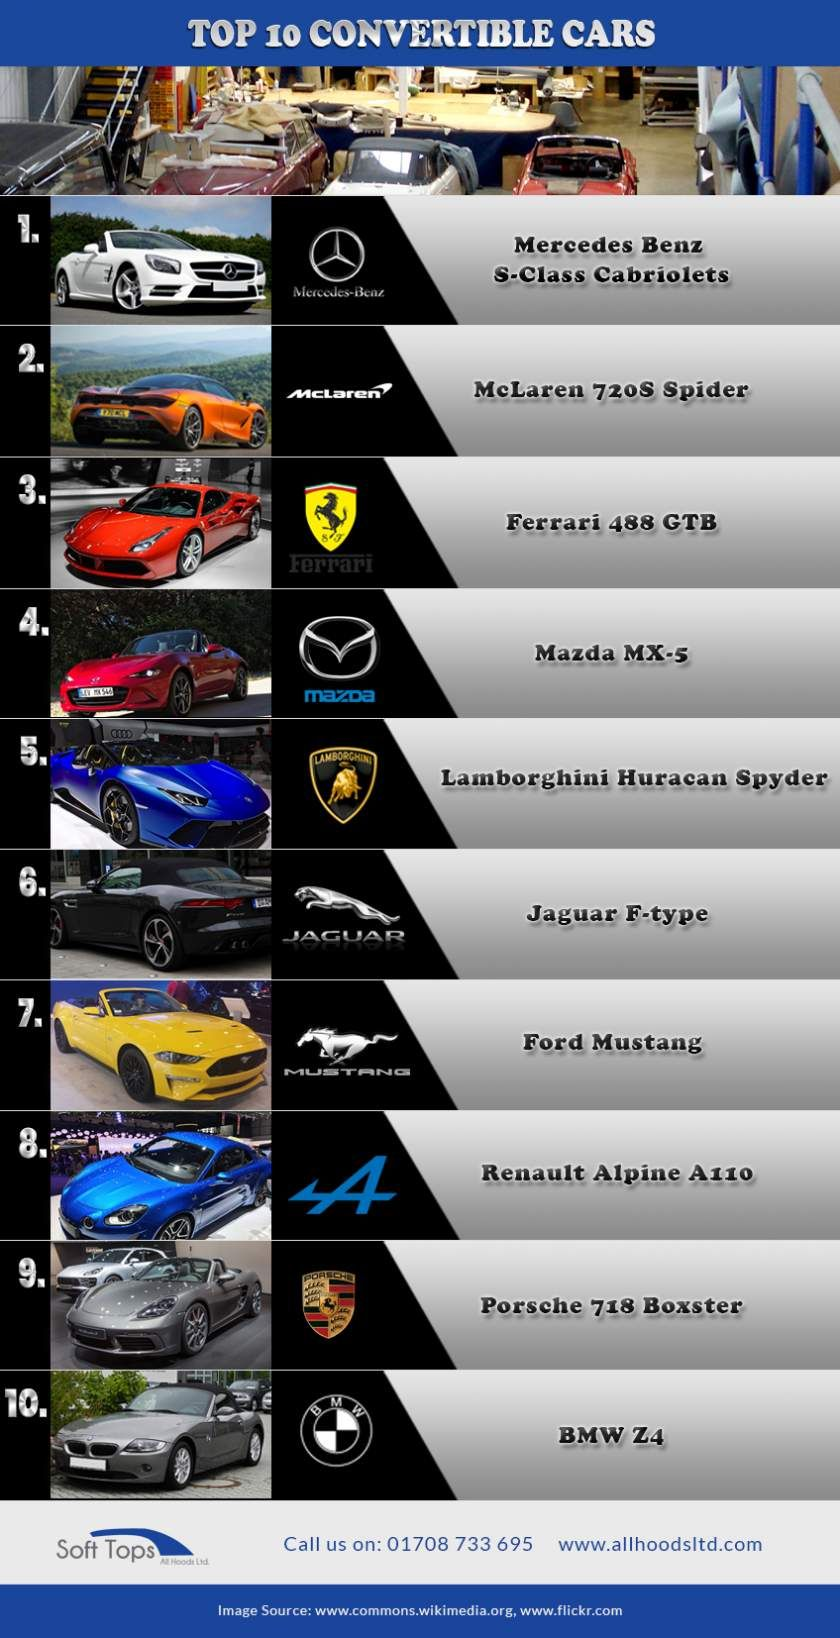 Top 10 Convertible Cars 2019 Infographic Portal Car Brands Logos Super Luxury Cars Luxury Car Logos